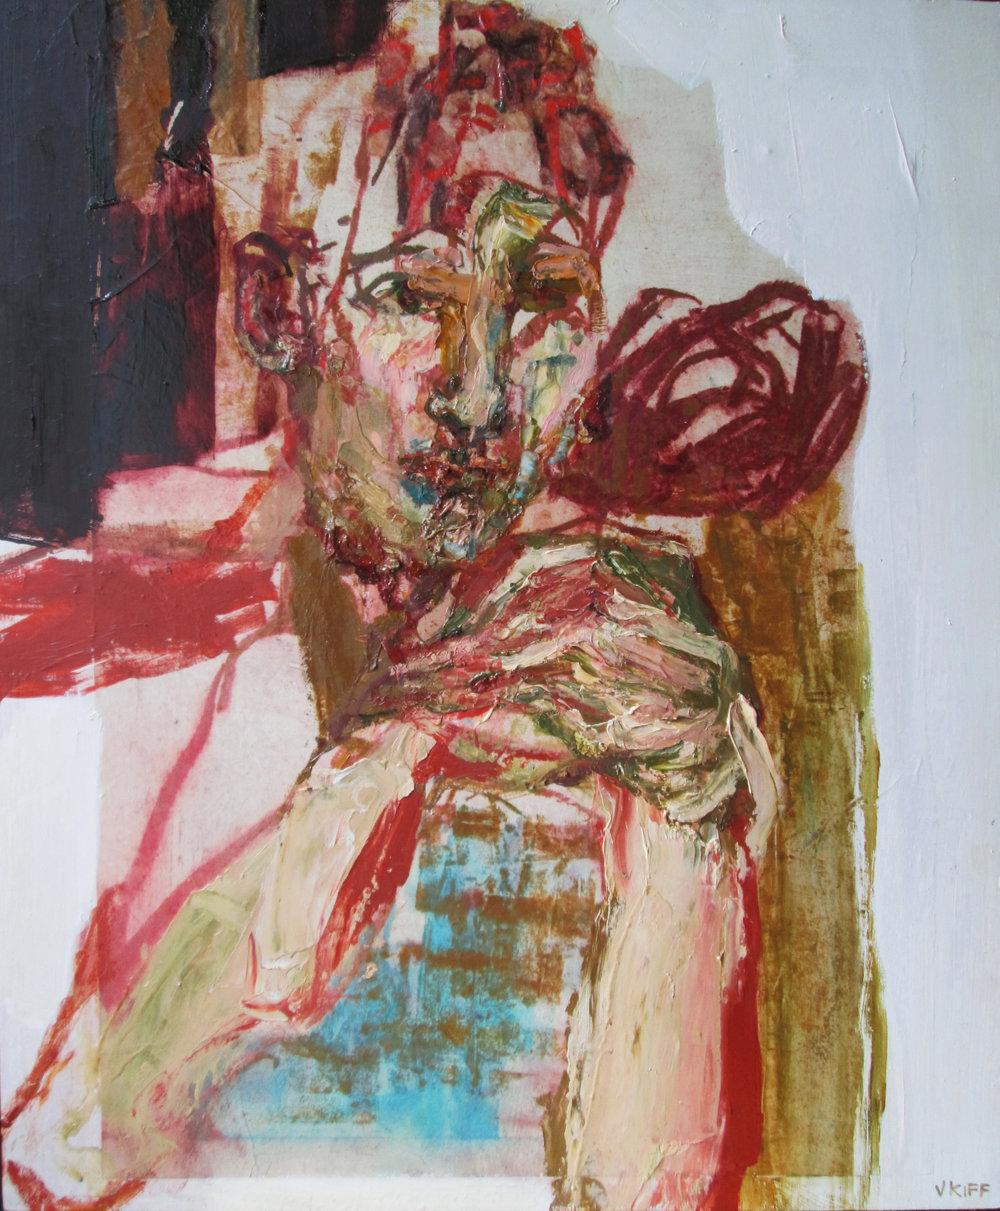 Title: The Flesh Andira  Size: 86 x 74 cm  Medium: Oil on wood panel  Price £2500